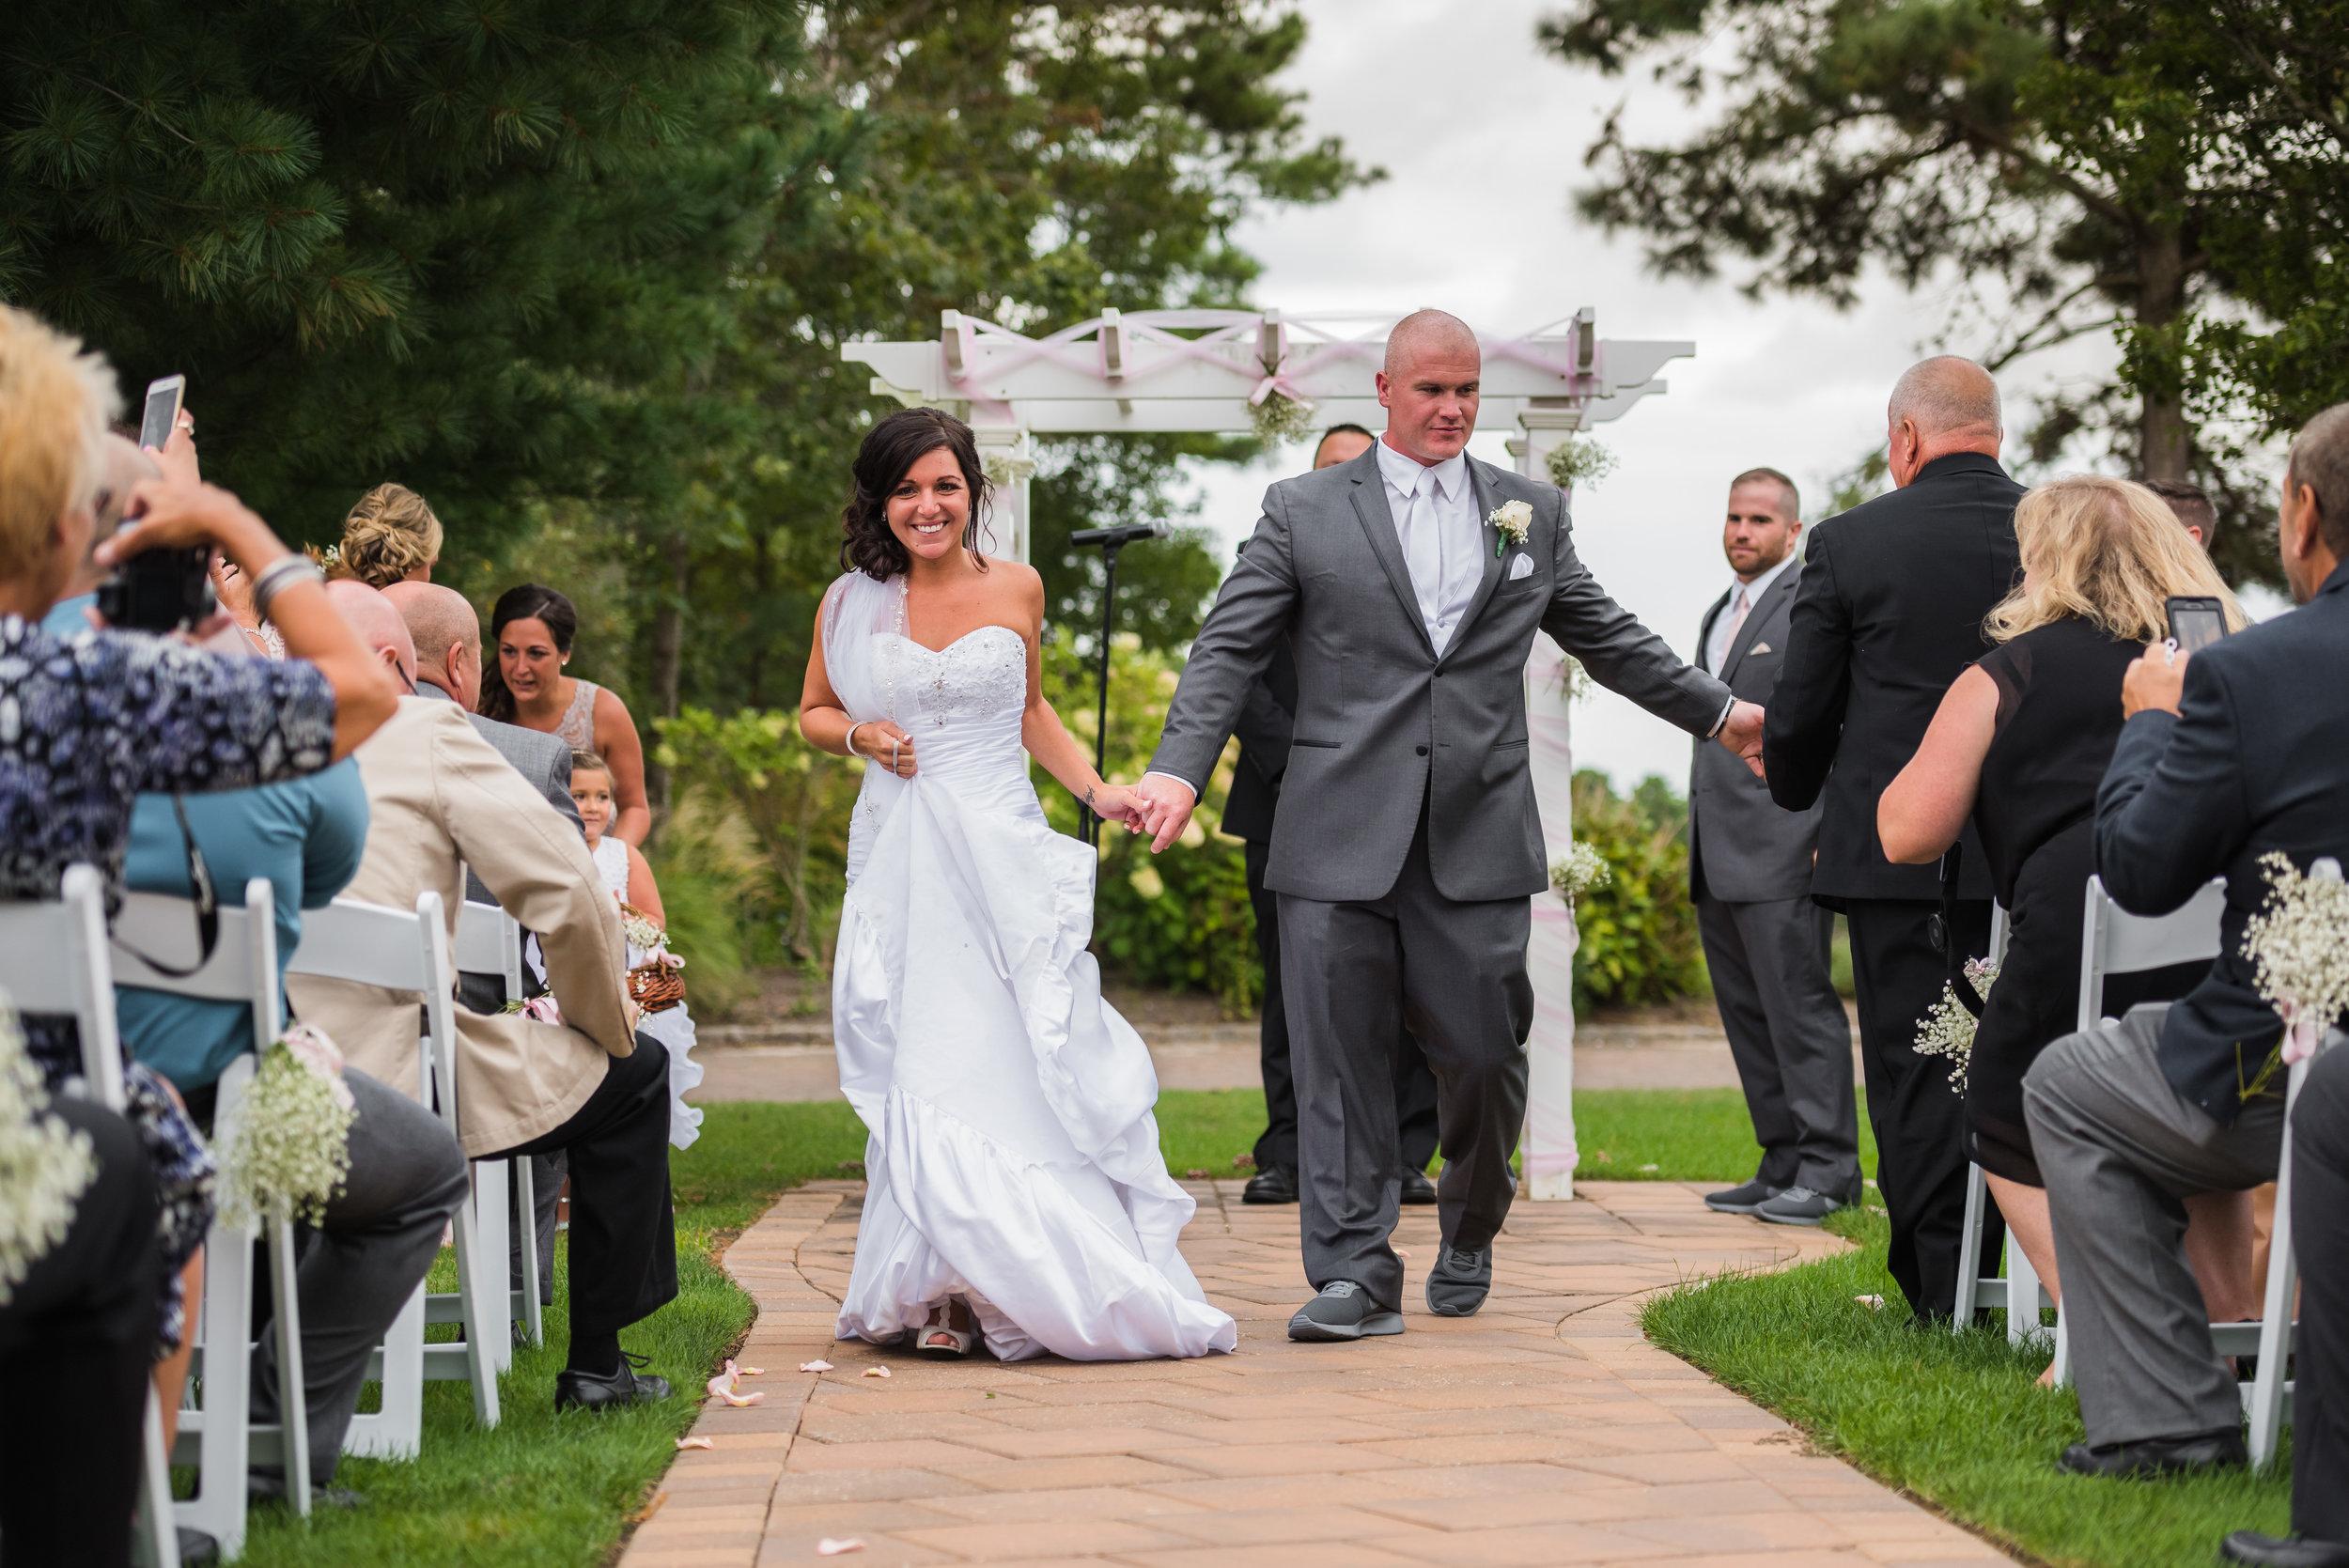 Seaoaks Wedding Photos Steph 24